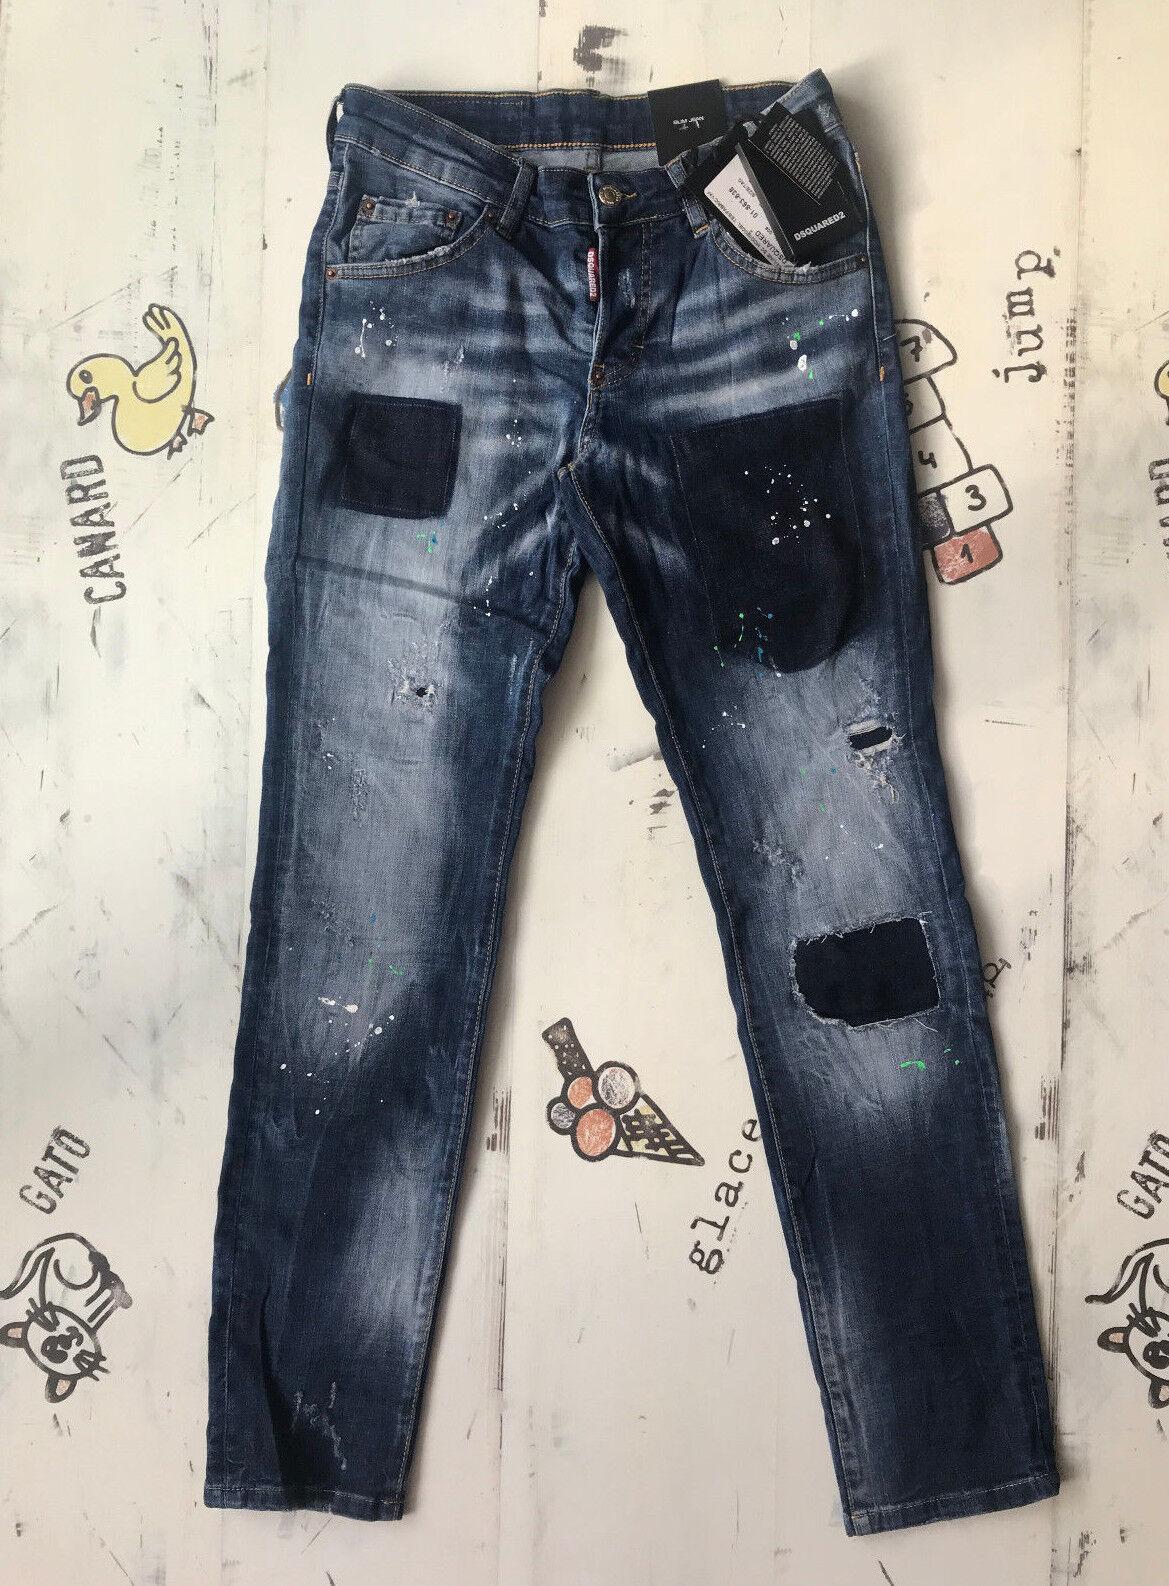 NEW Dsquared Slim Jean Jeans Waist 34    Inseam 30  SIZE 52